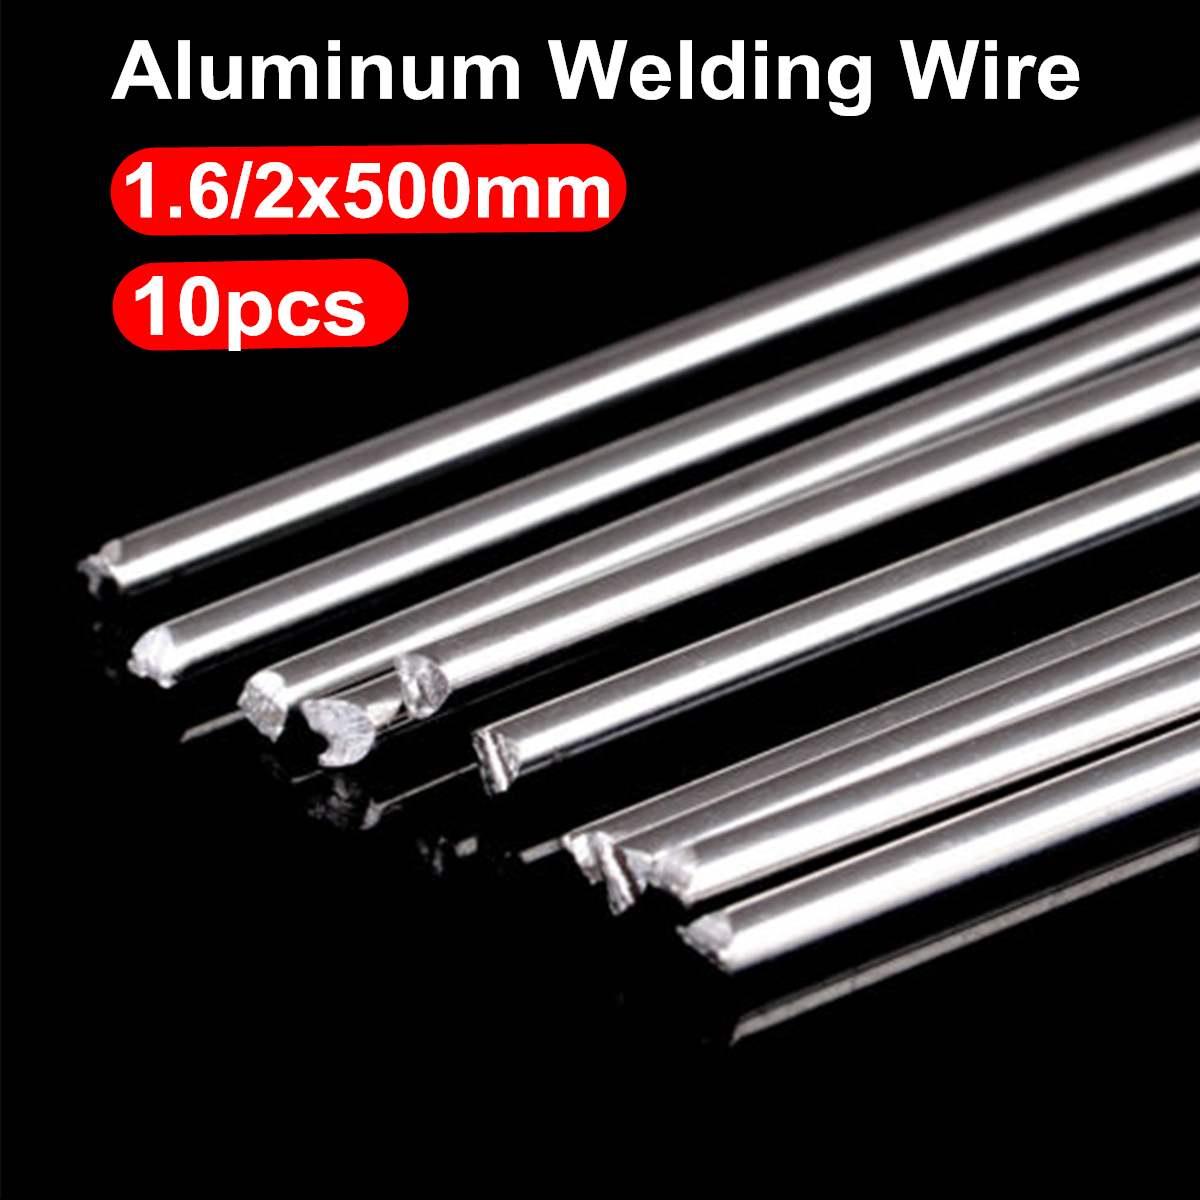 10pcs Aluminum Welding Rods Low Temperature Soldering Sticks Flux-Cored Rod Kits 1.6mm/2mm No Need Solder Powder